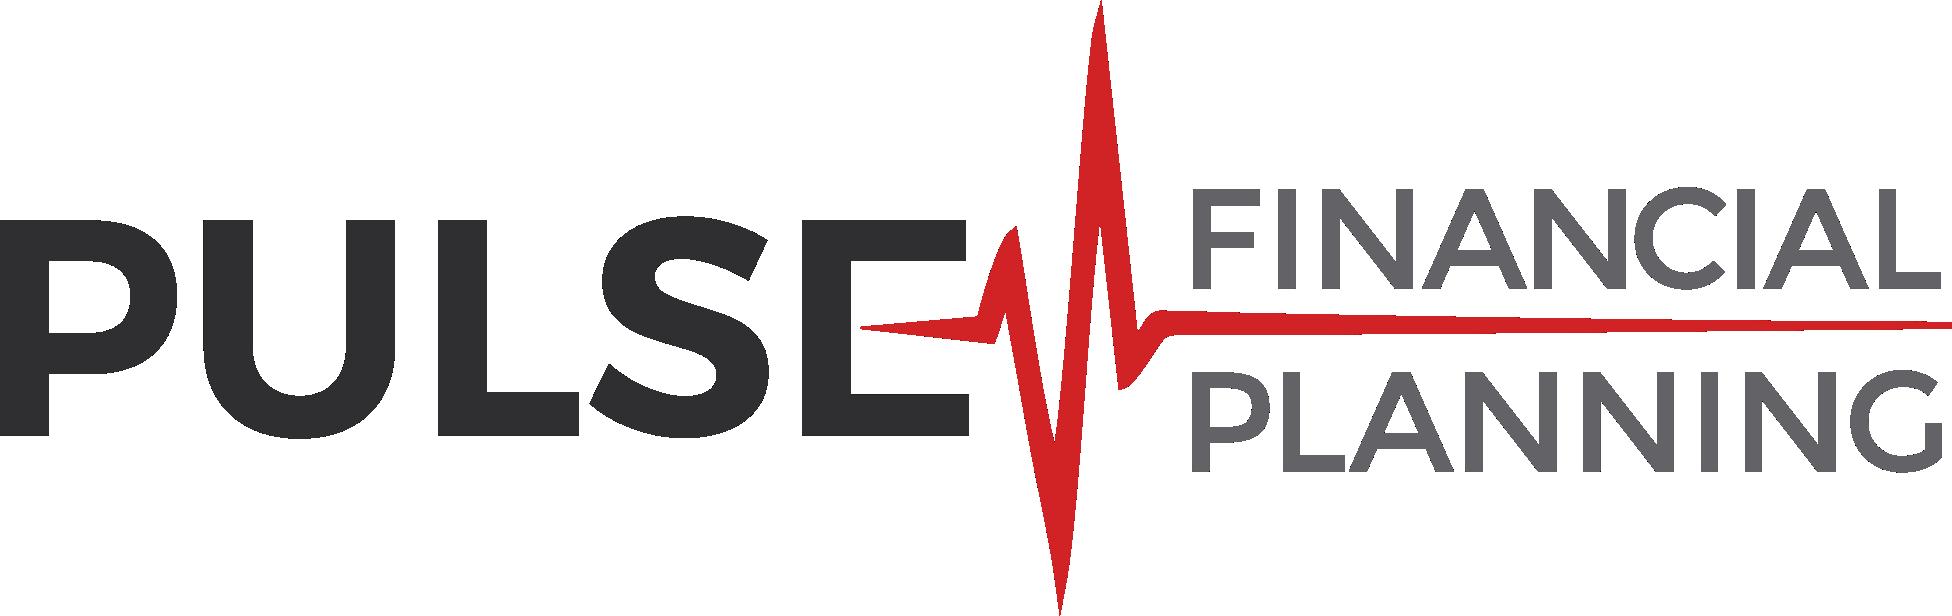 pulseplanning Logo